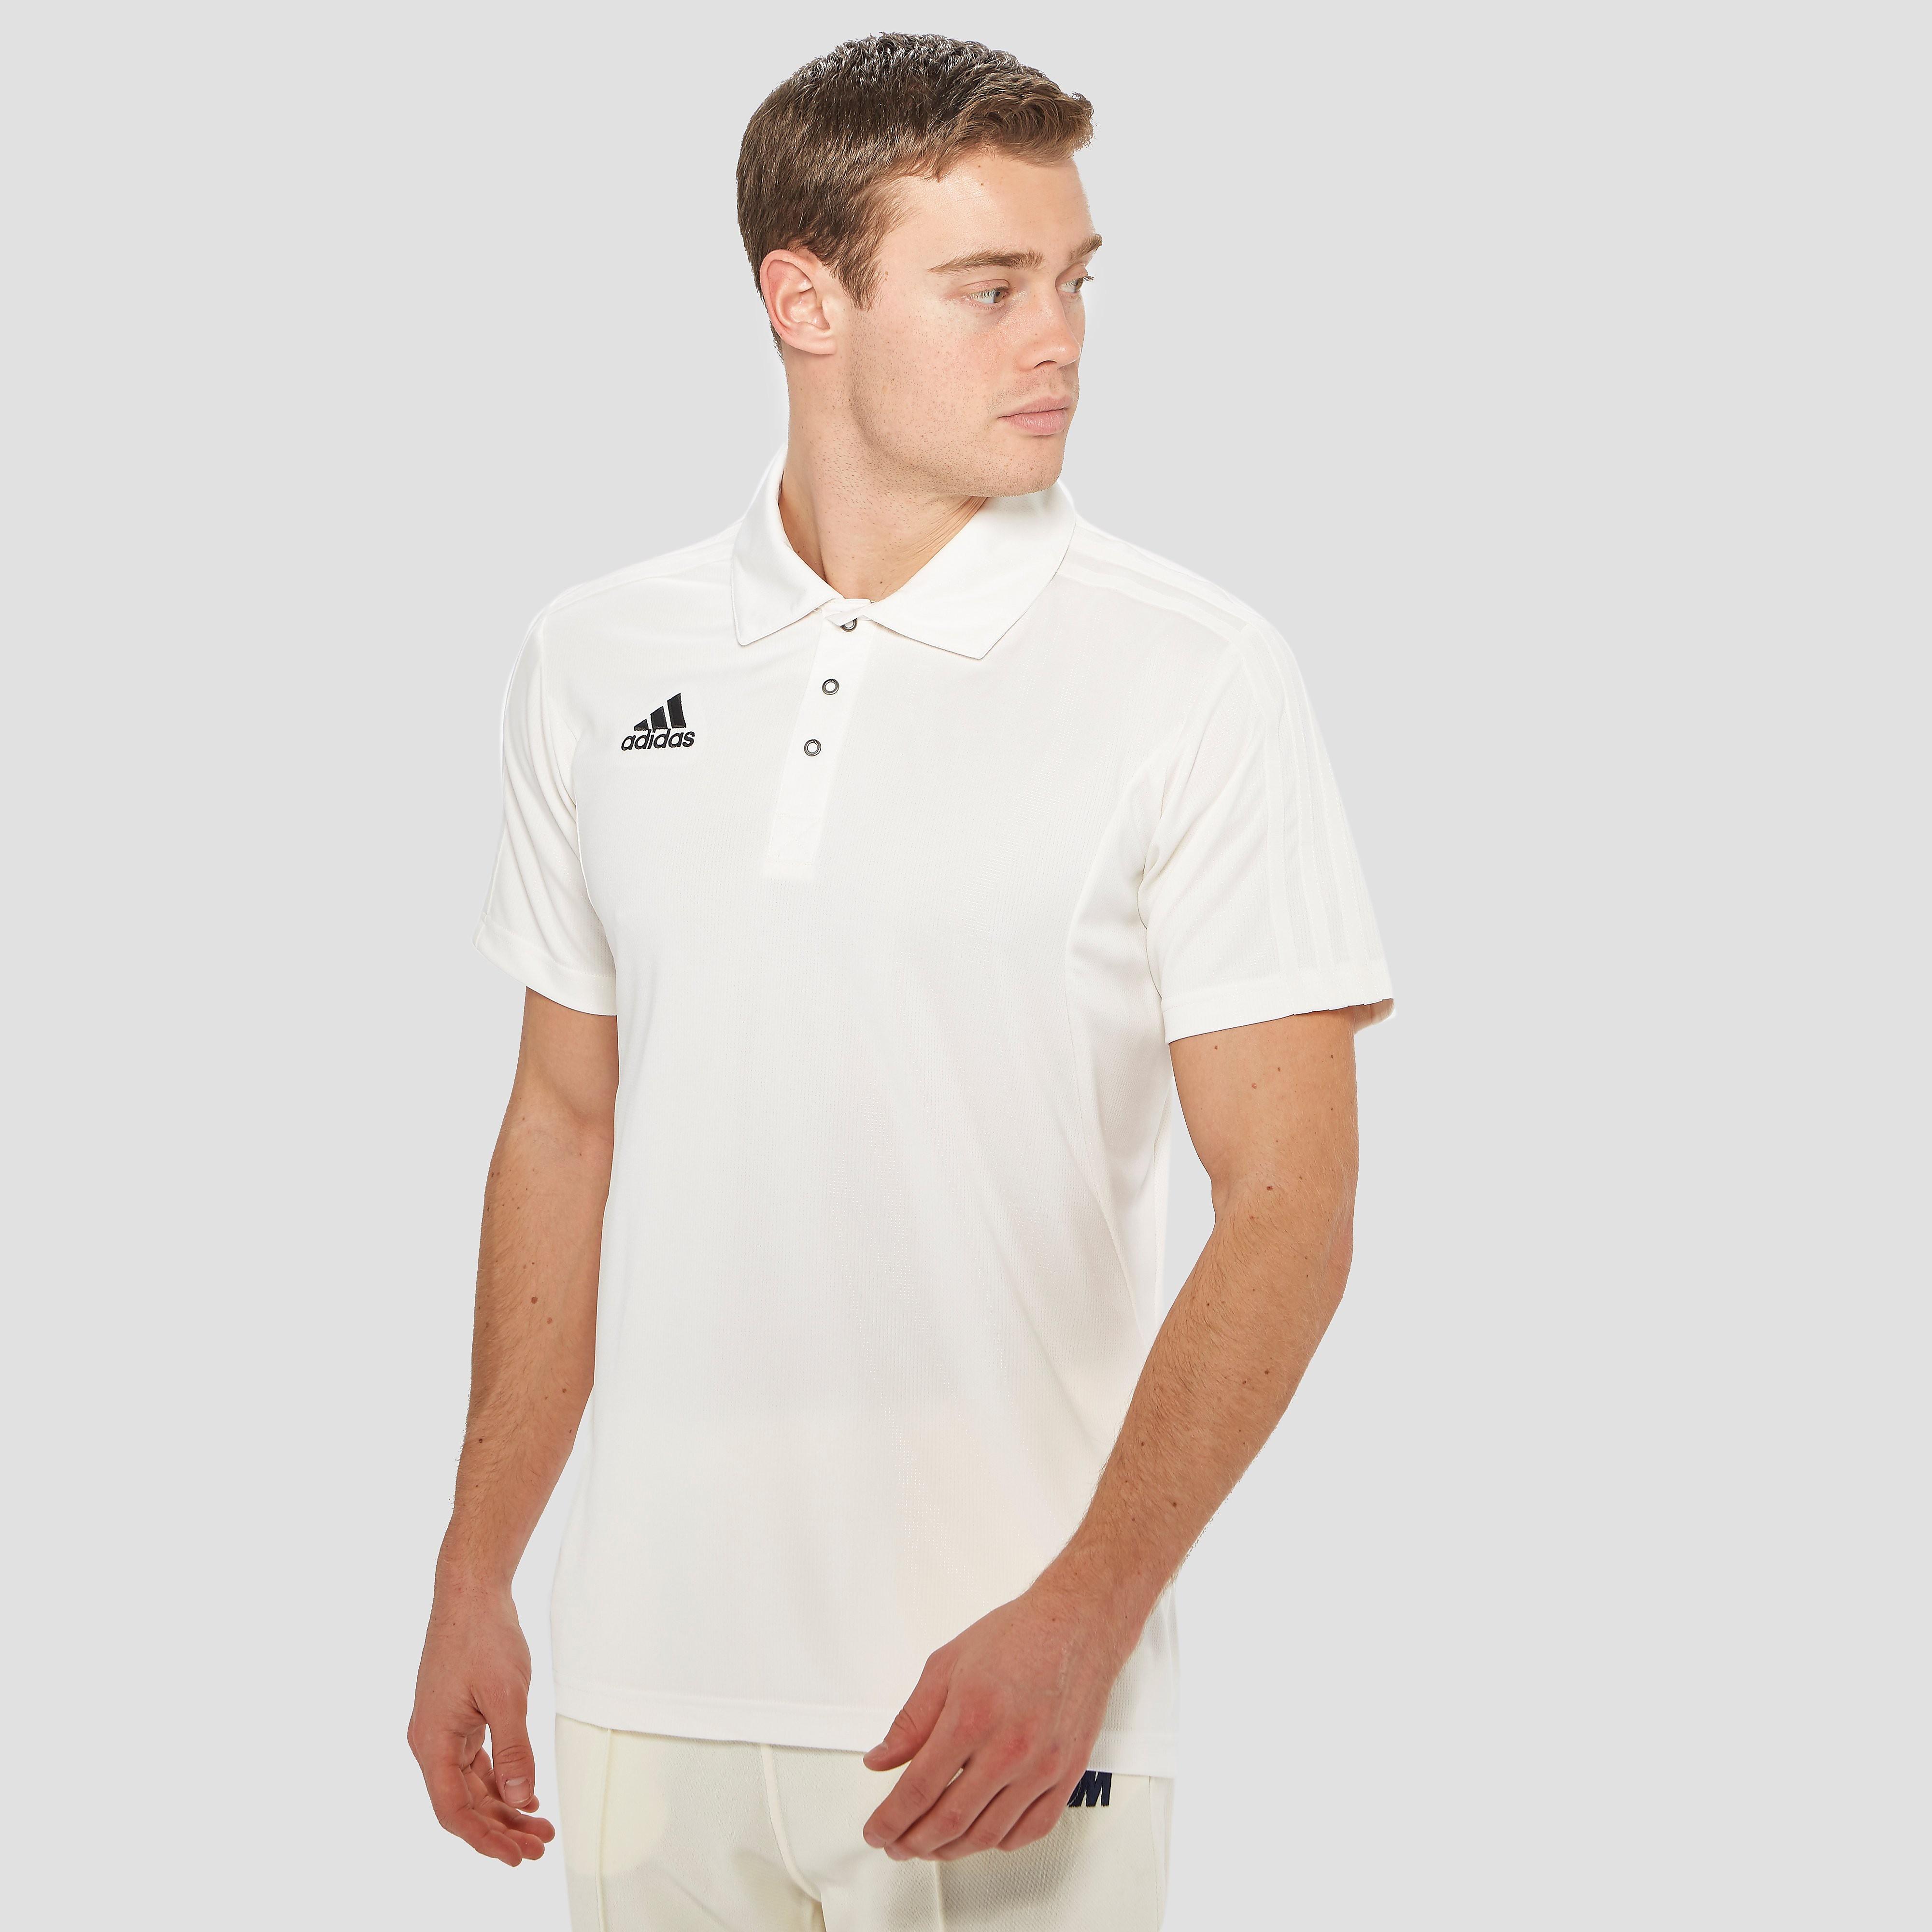 adidas Short Sleeve Men's Cricket Shirt